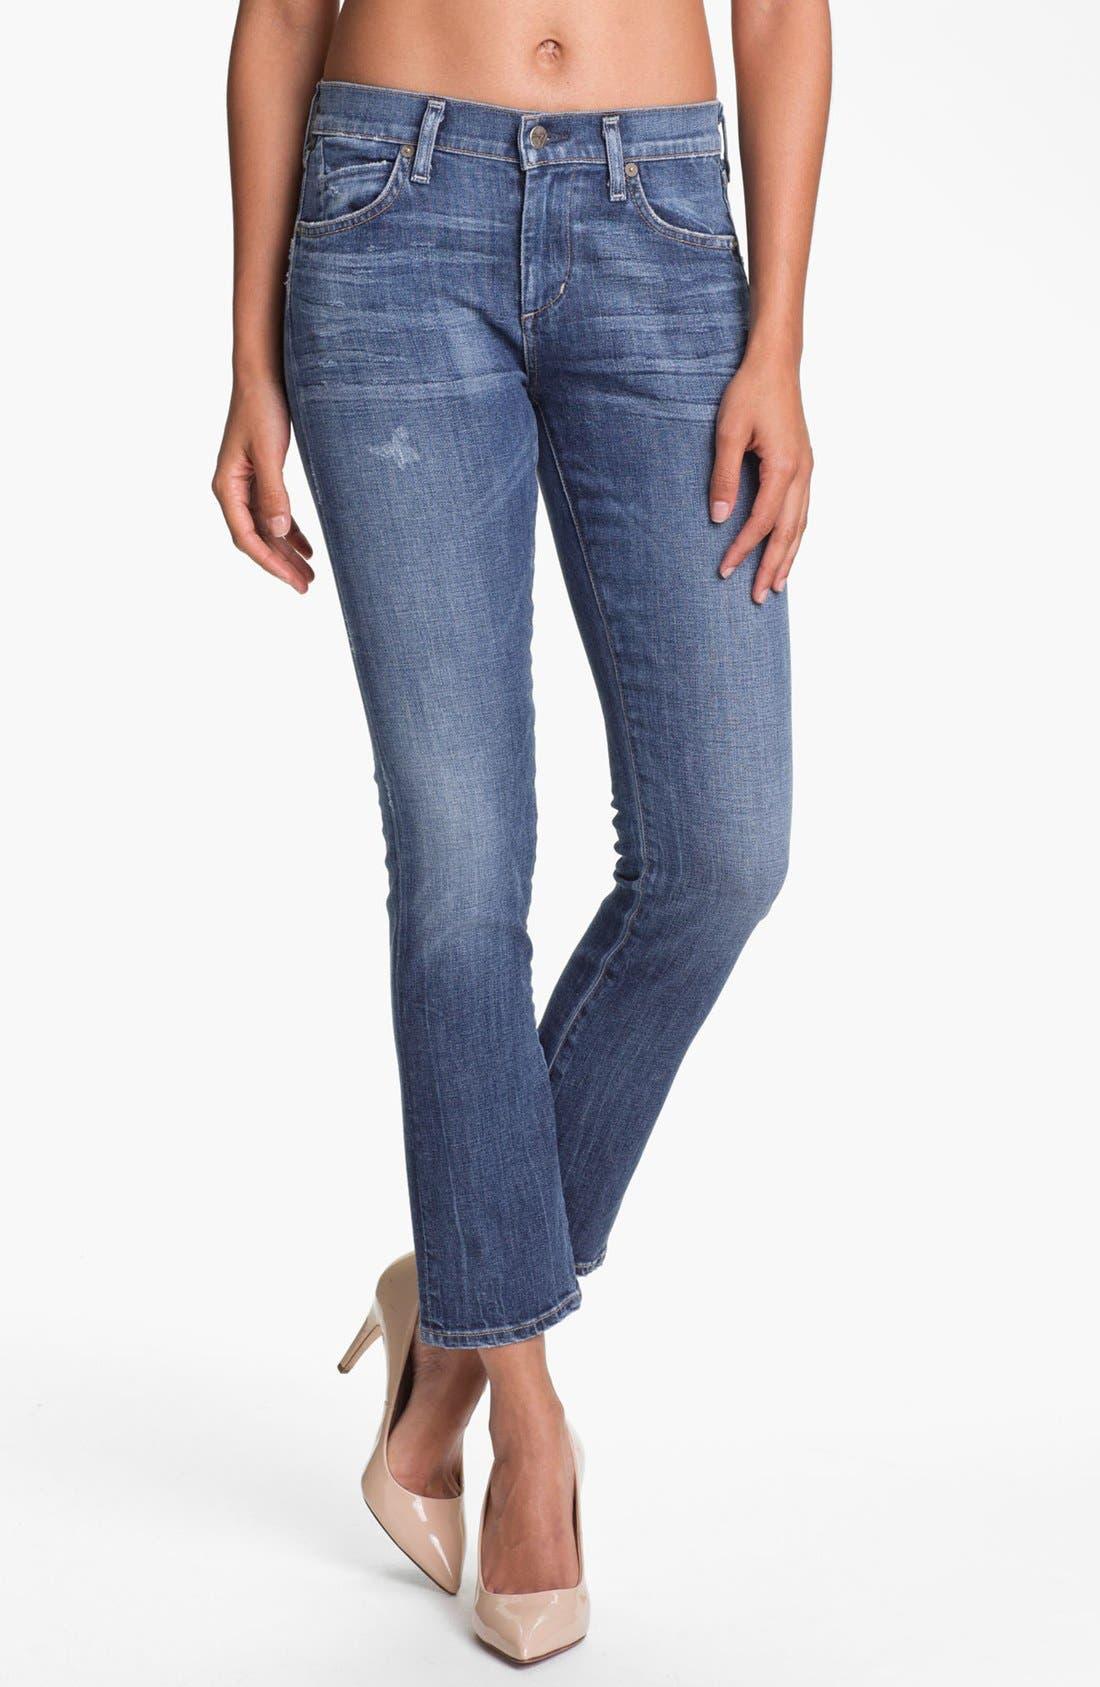 Alternate Image 1 Selected - Citizens of Humanity 'Carlton' High Waist Straight Leg Jeans (Nova)